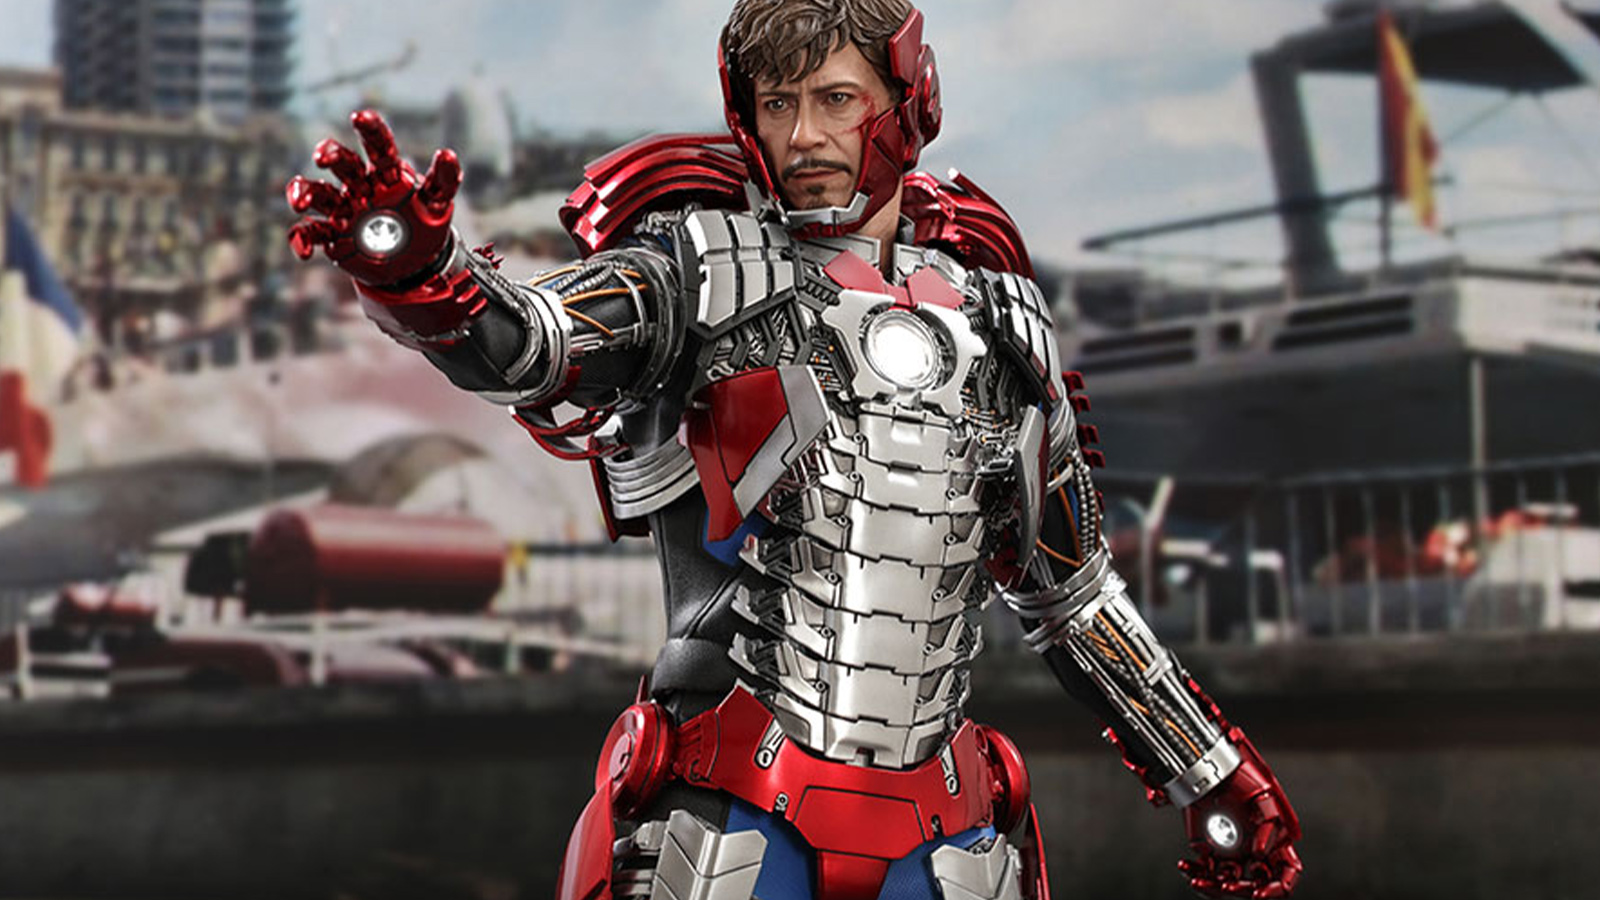 Hot-Toys-Tony-Stark-Mark-V-Suit-Up-Version-01